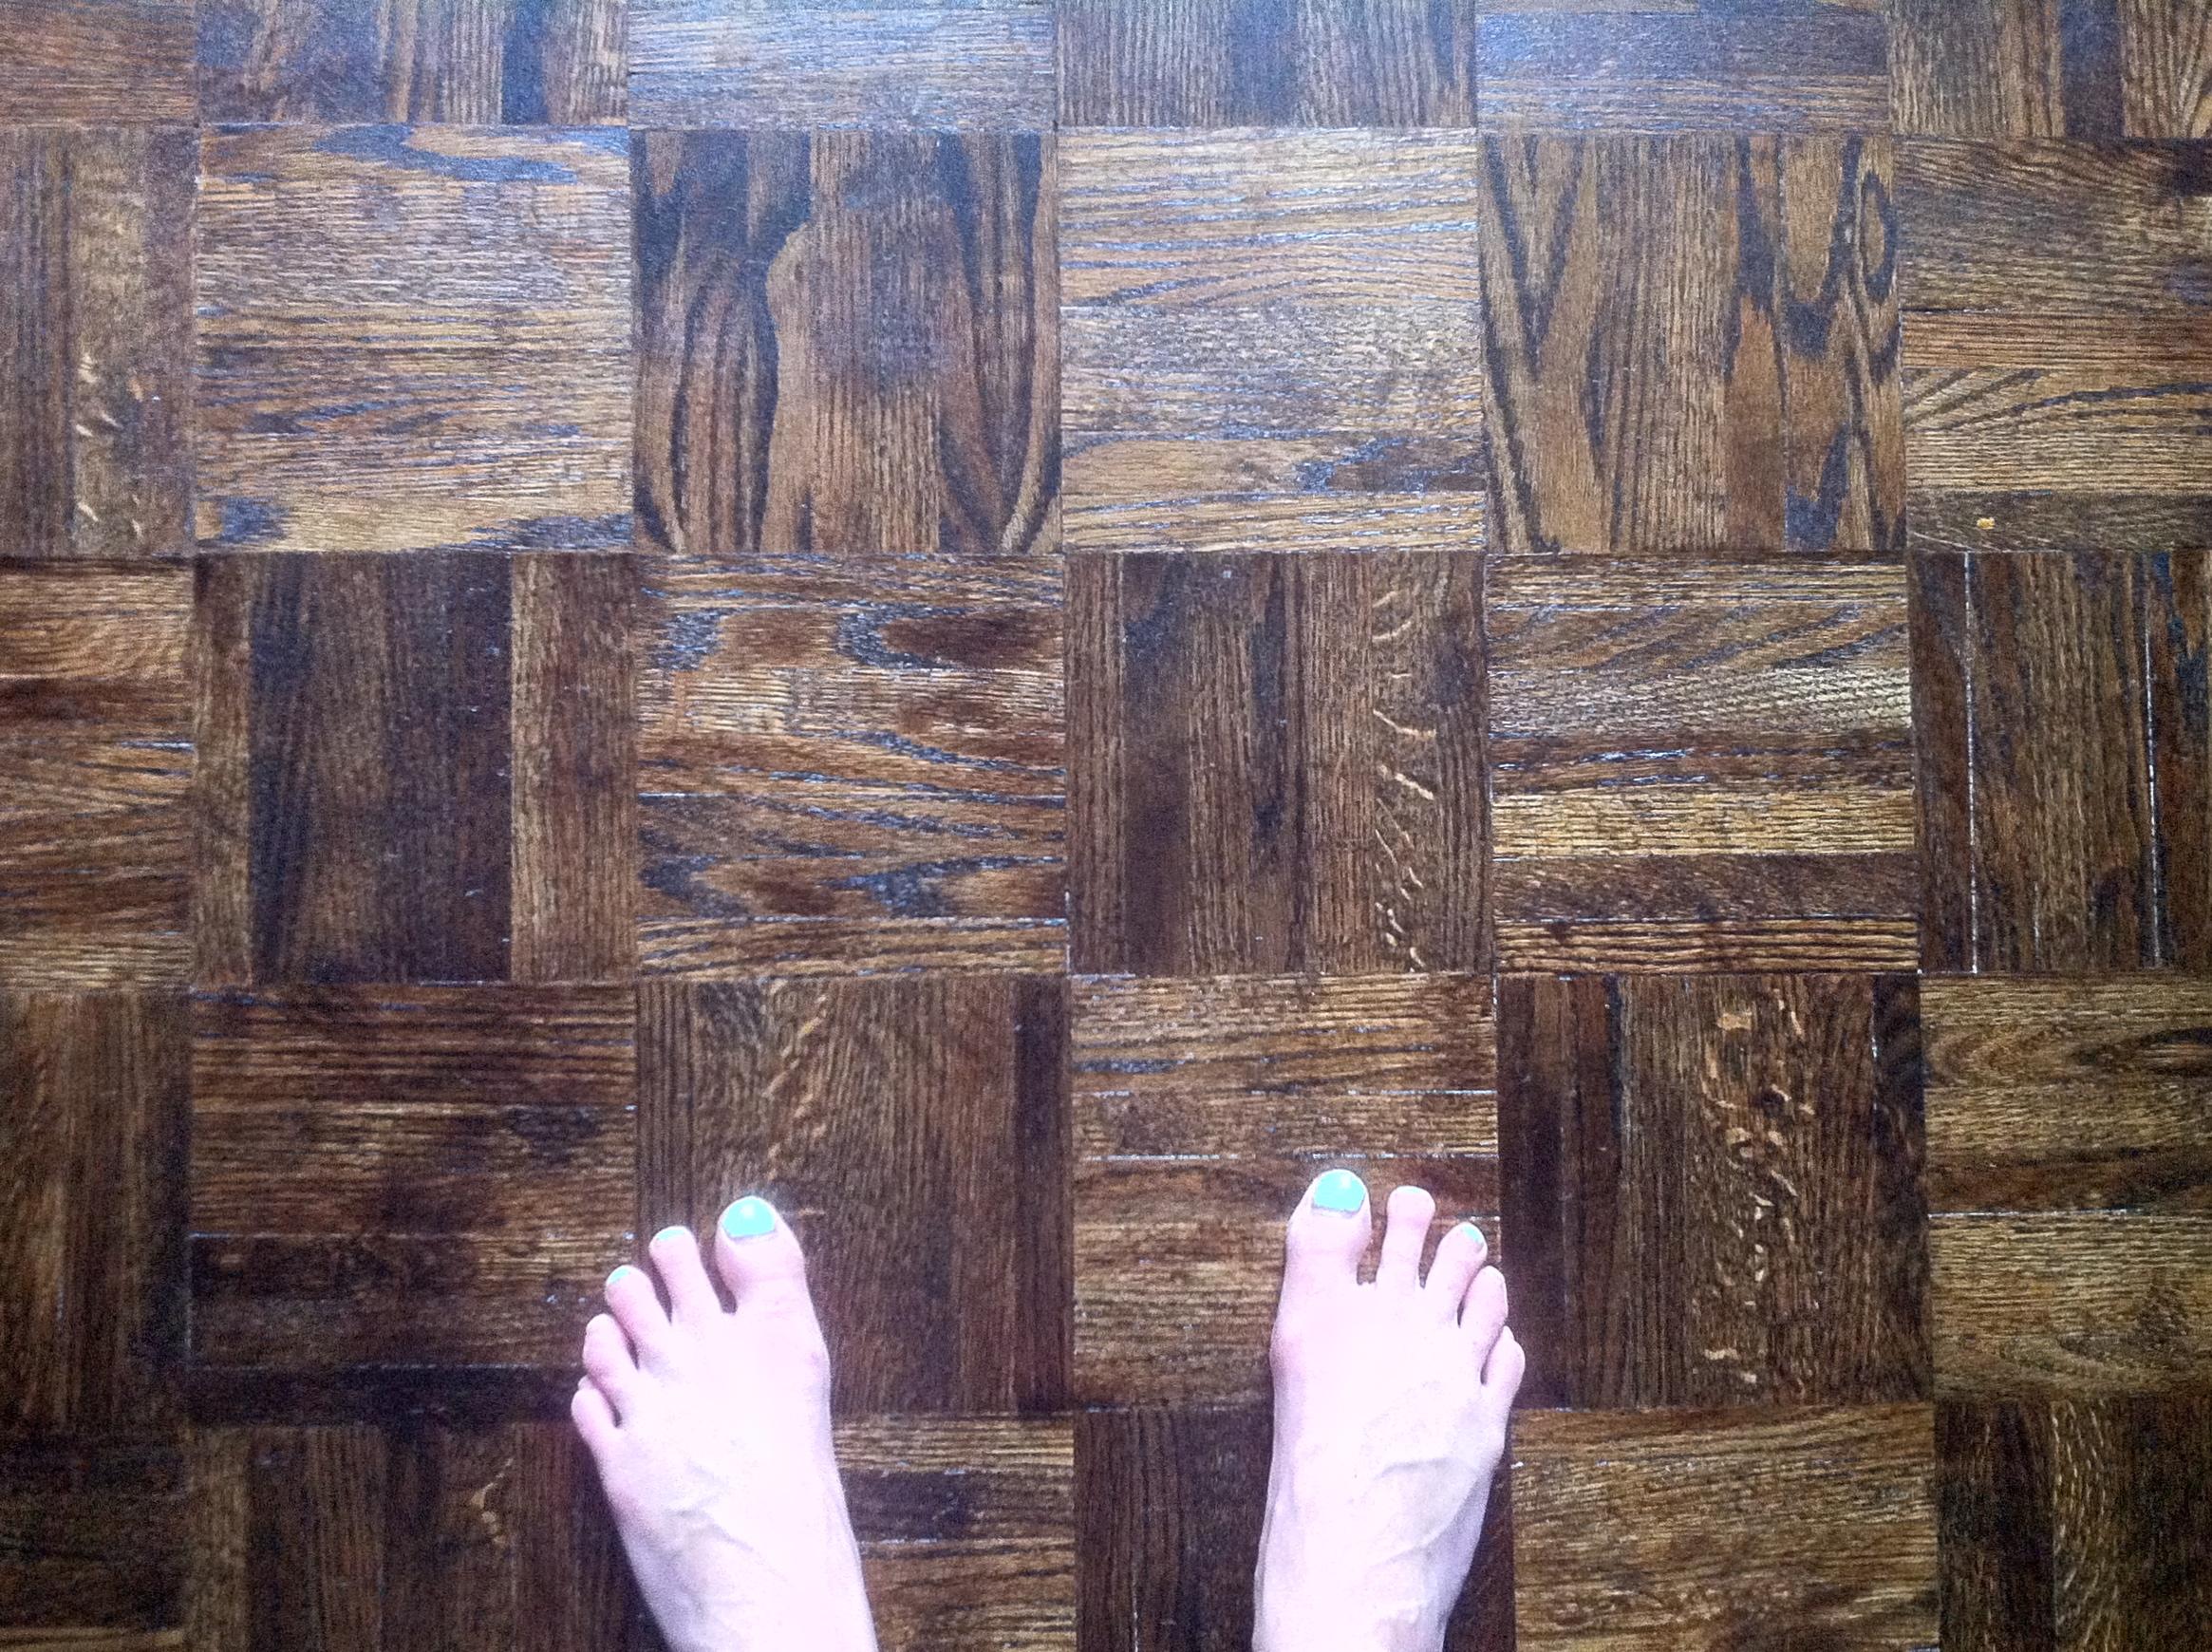 refinish kitchen sink basin parquet floors – refinished! | harbour dweller